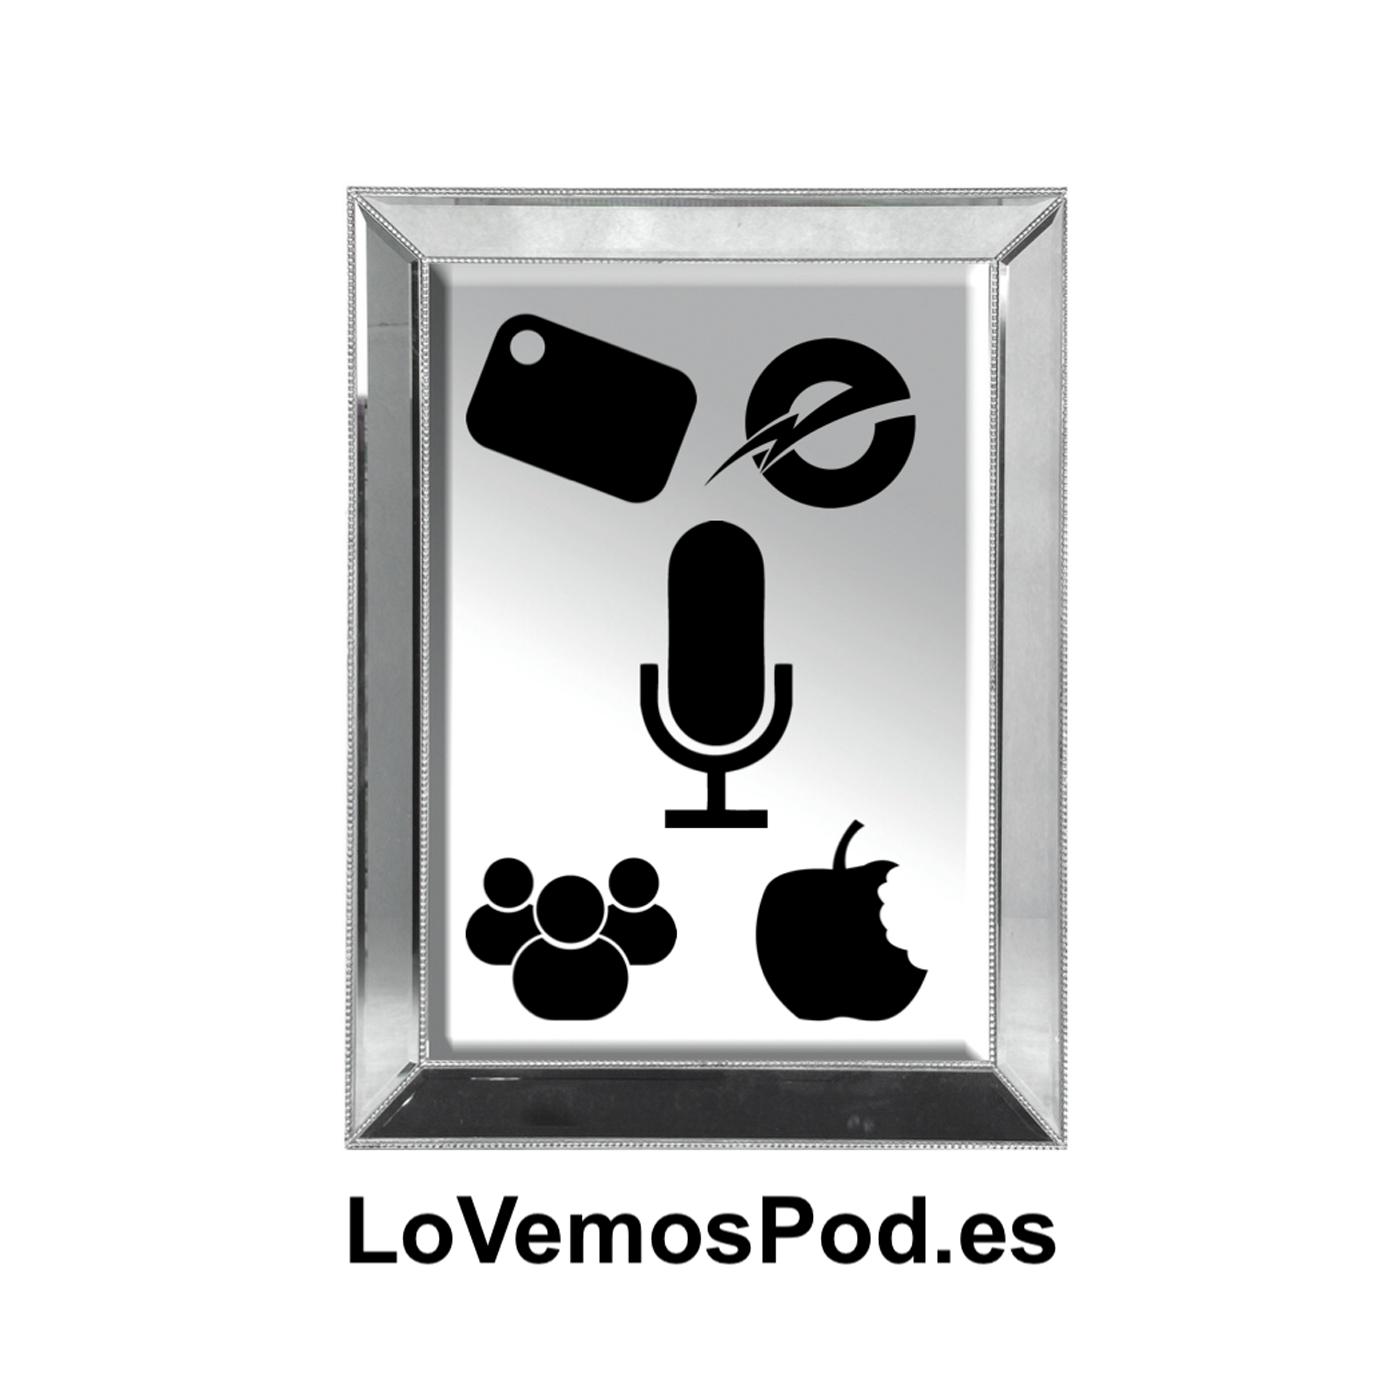 Lo vemos Podcast